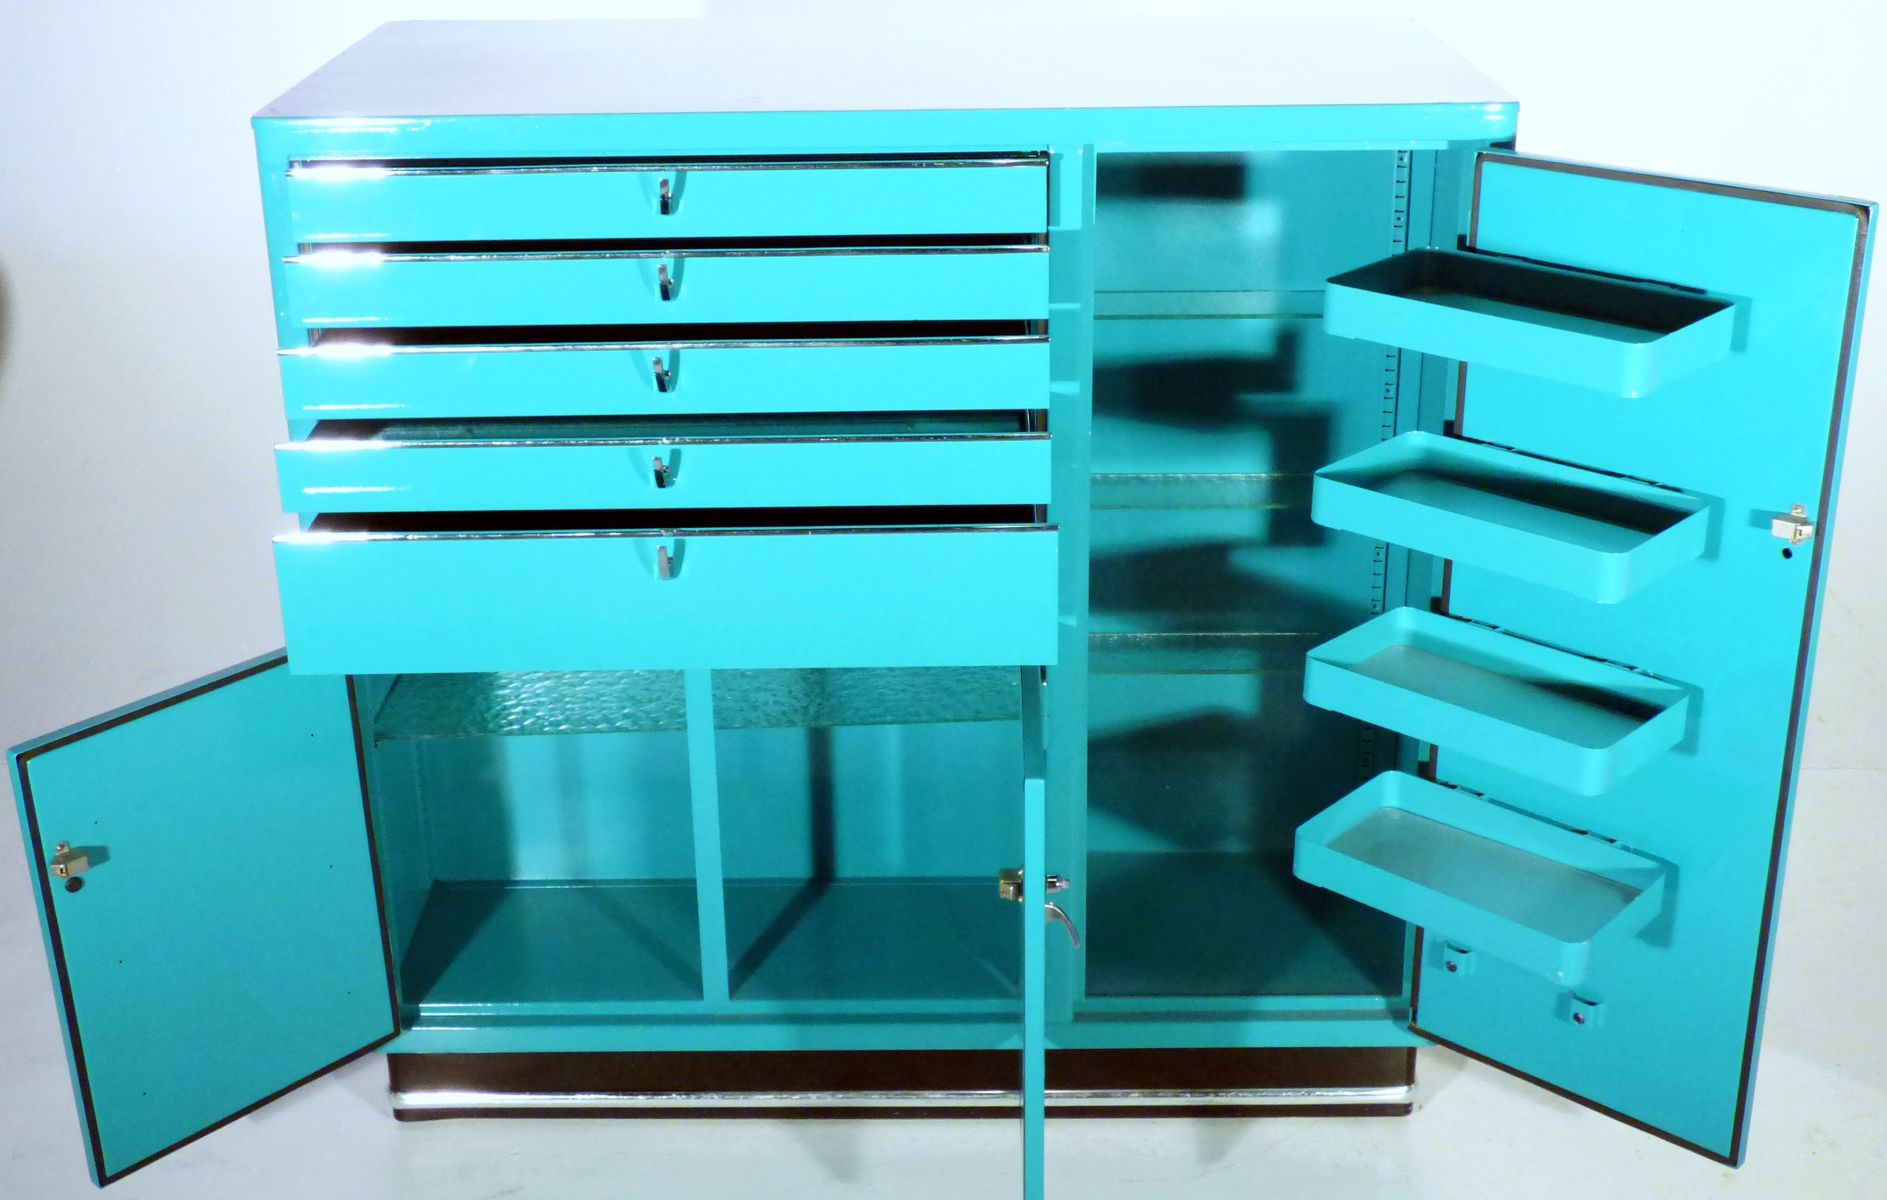 Armoire 224 Pharmacie Vintage Turquoise Par Karl Baisch En